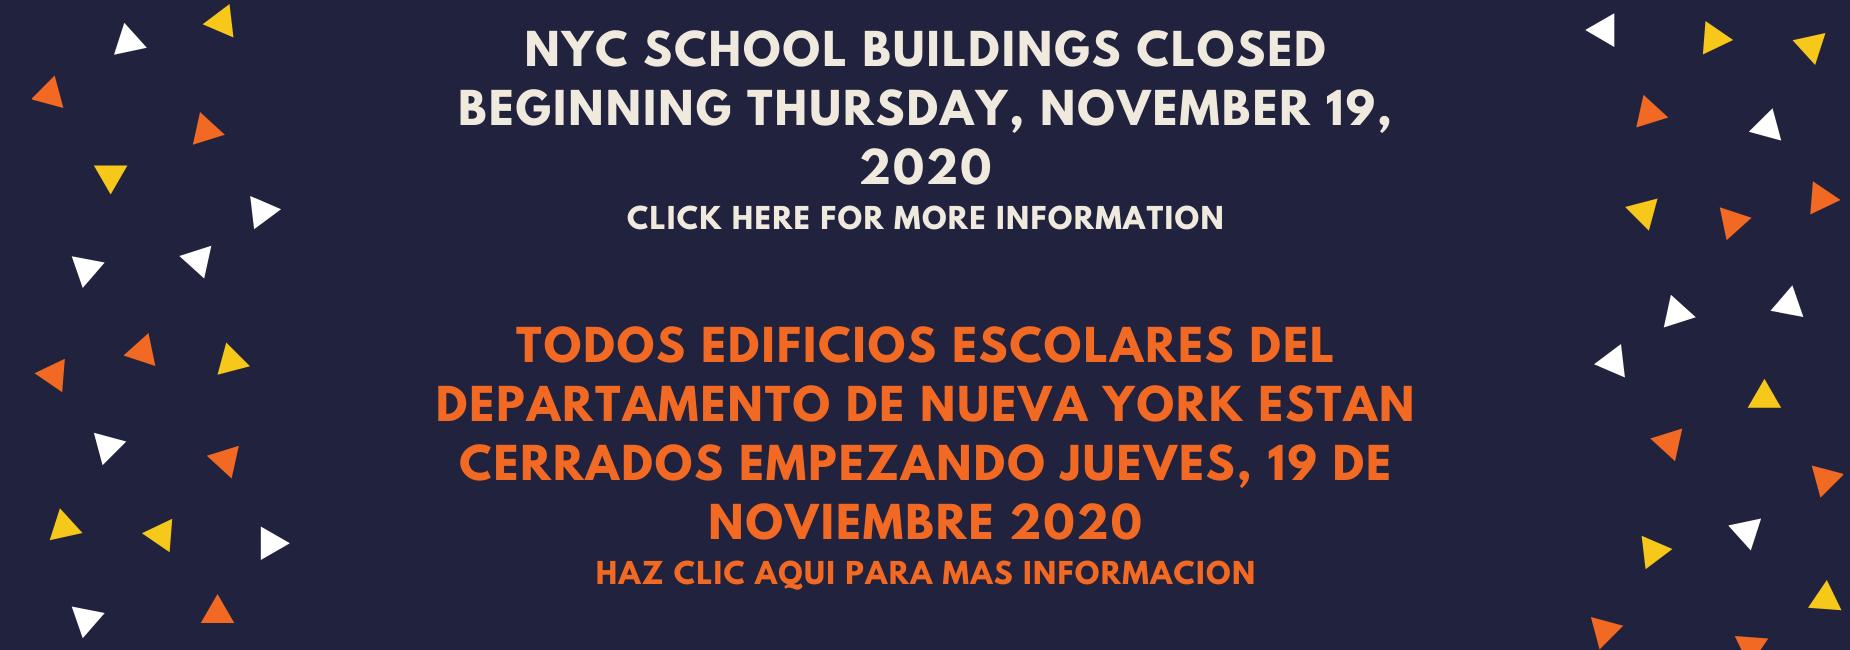 Temporary School Closing Starting November 19, 2020 Bilingual